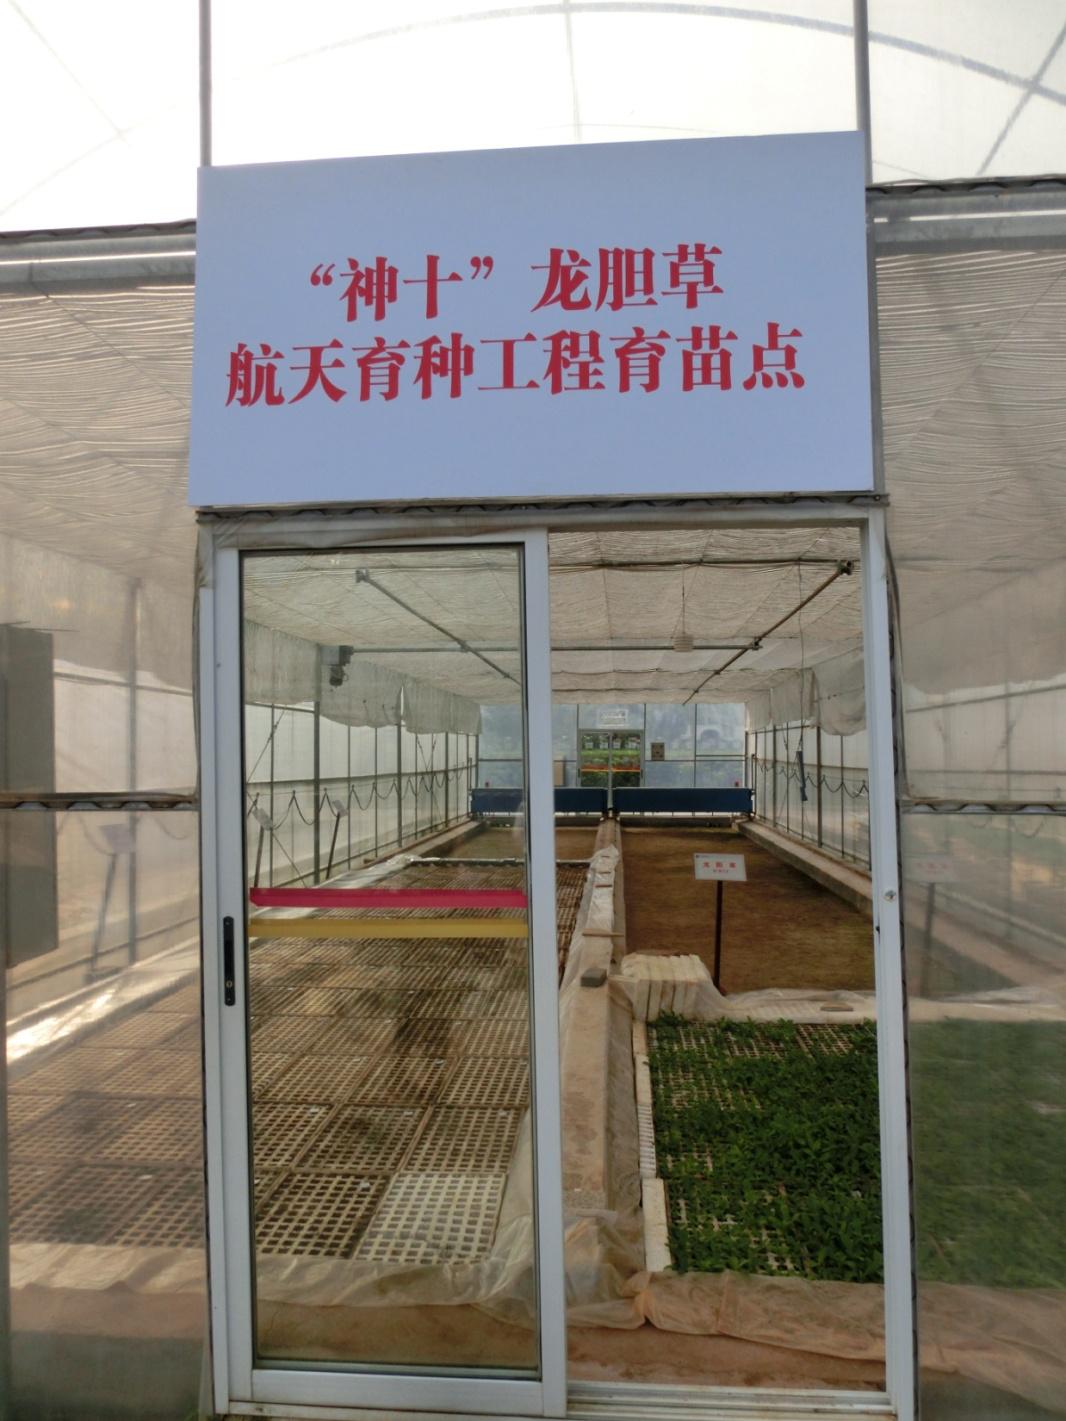 太空育栽基地